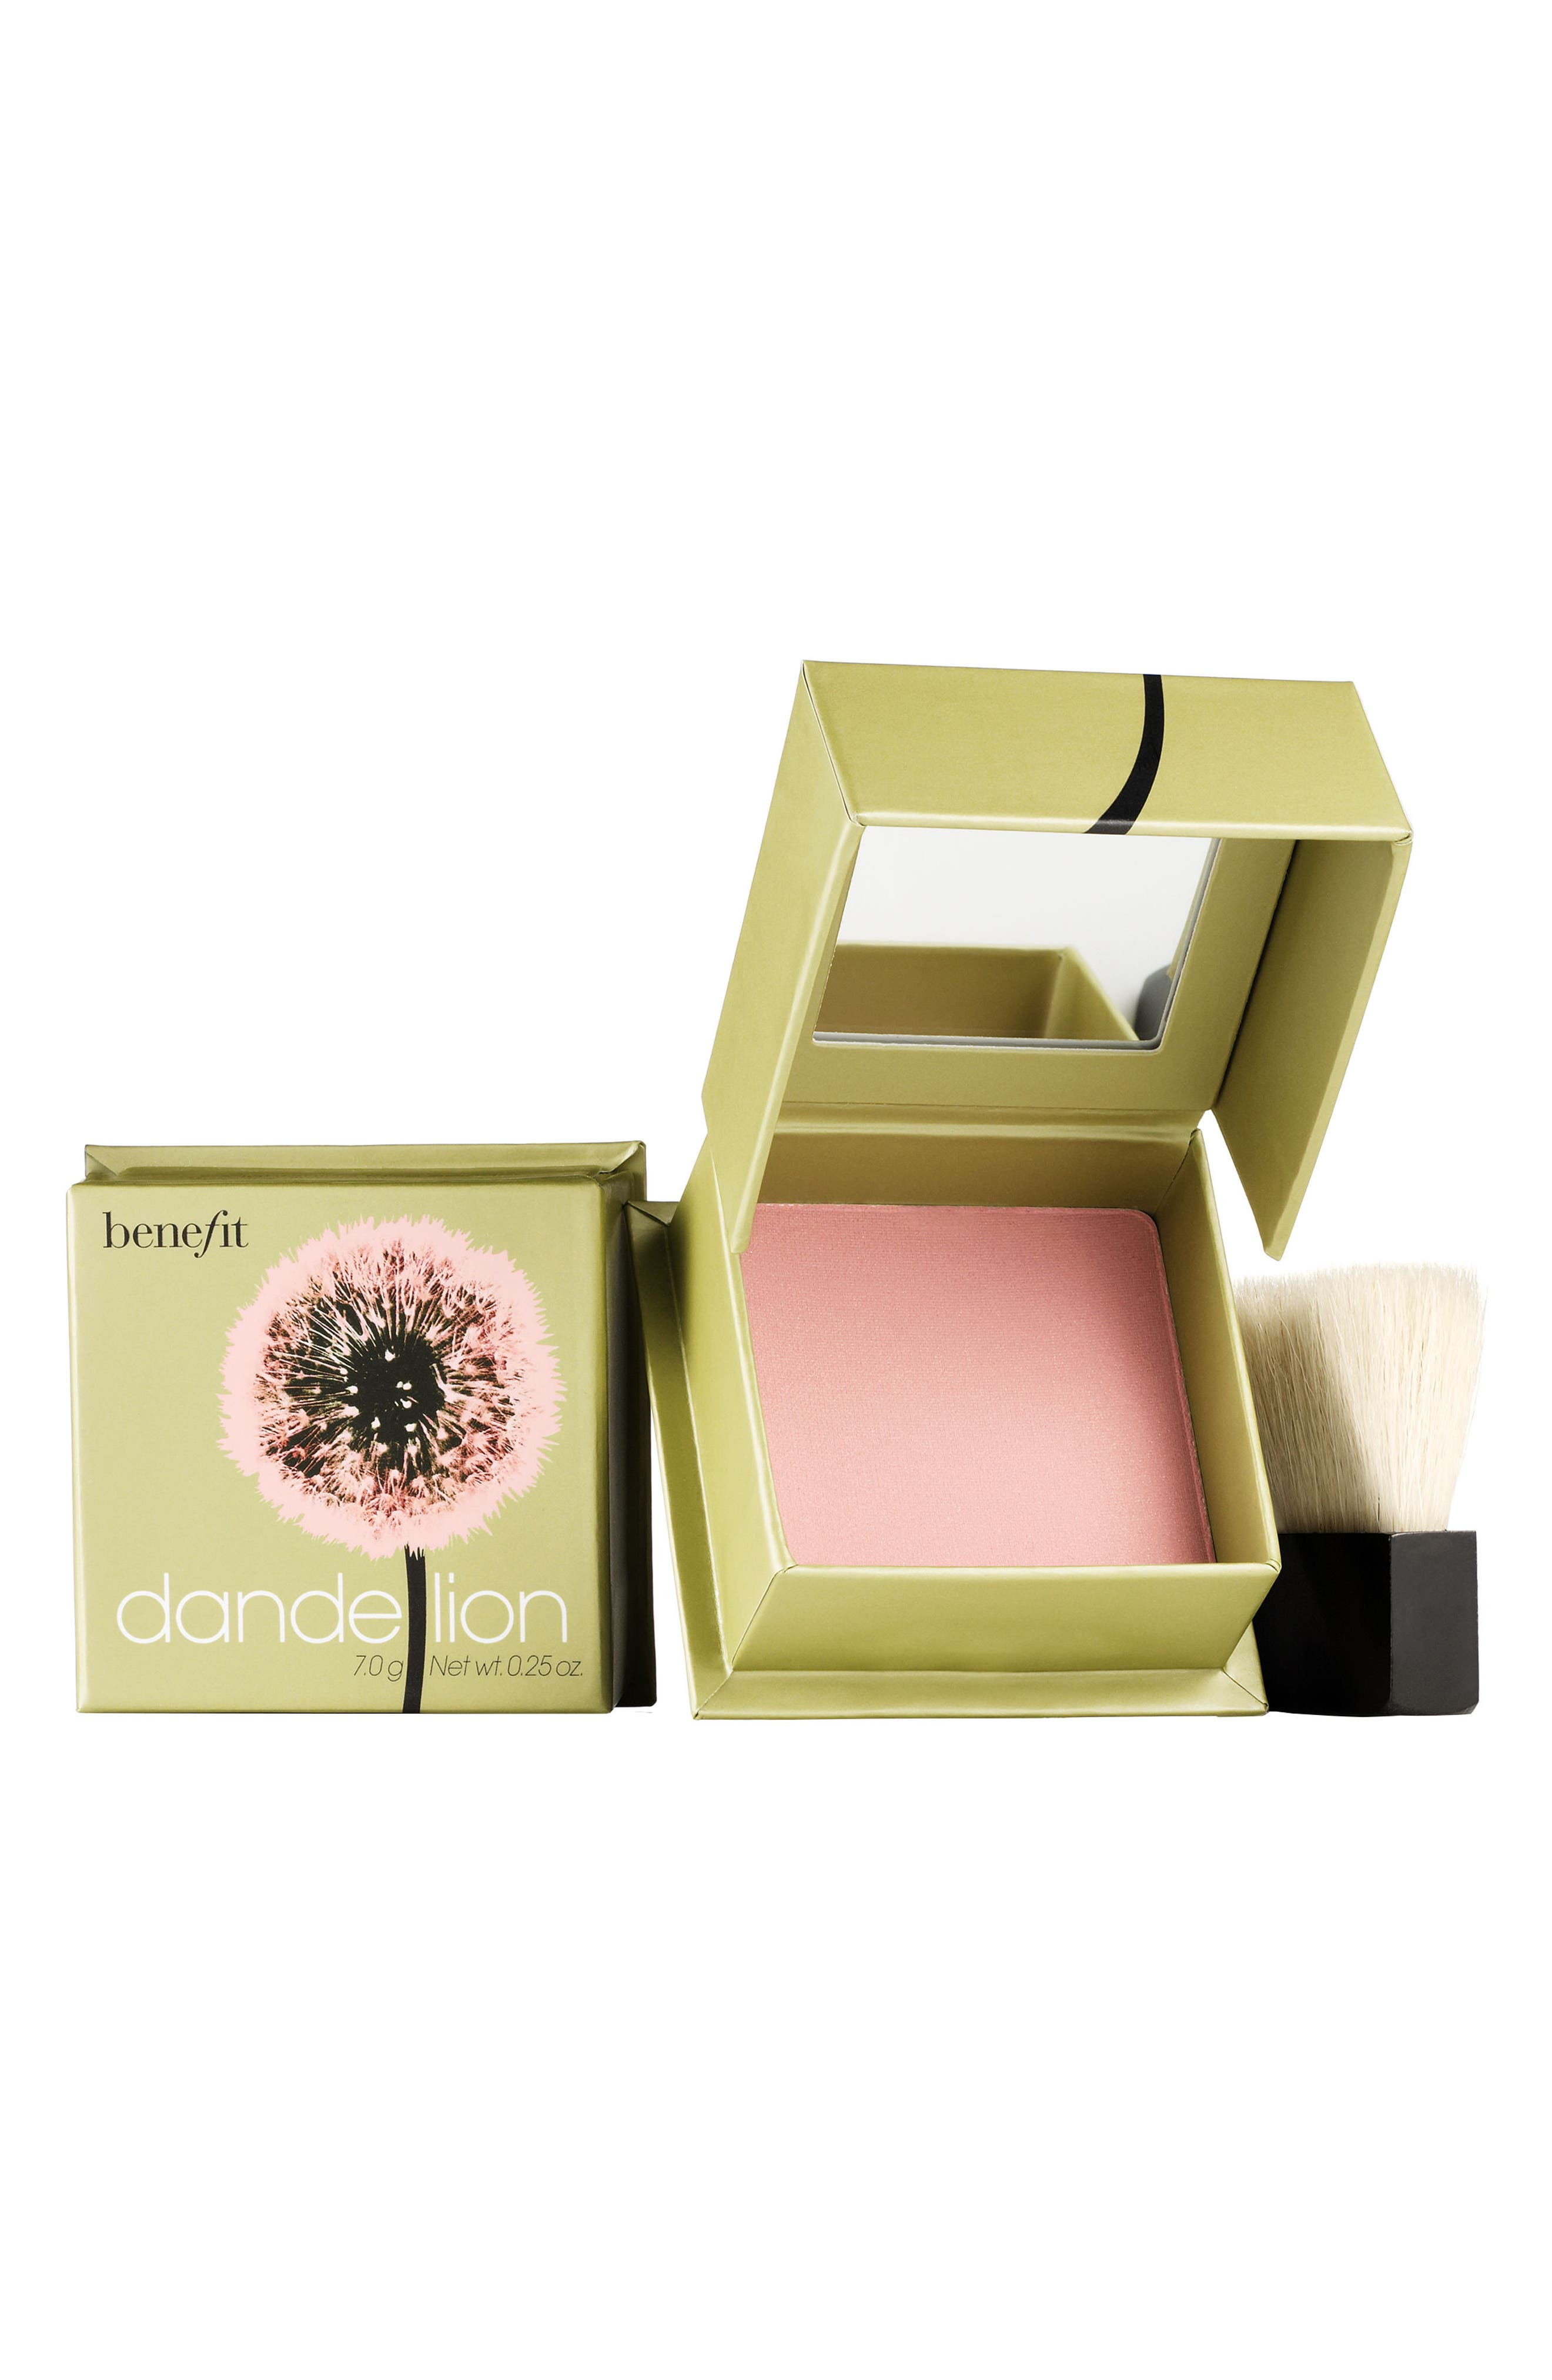 BENEFIT COSMETICS, Benefit Dandelion Brightening Powder Blush, Main thumbnail 1, color, BABY PINK